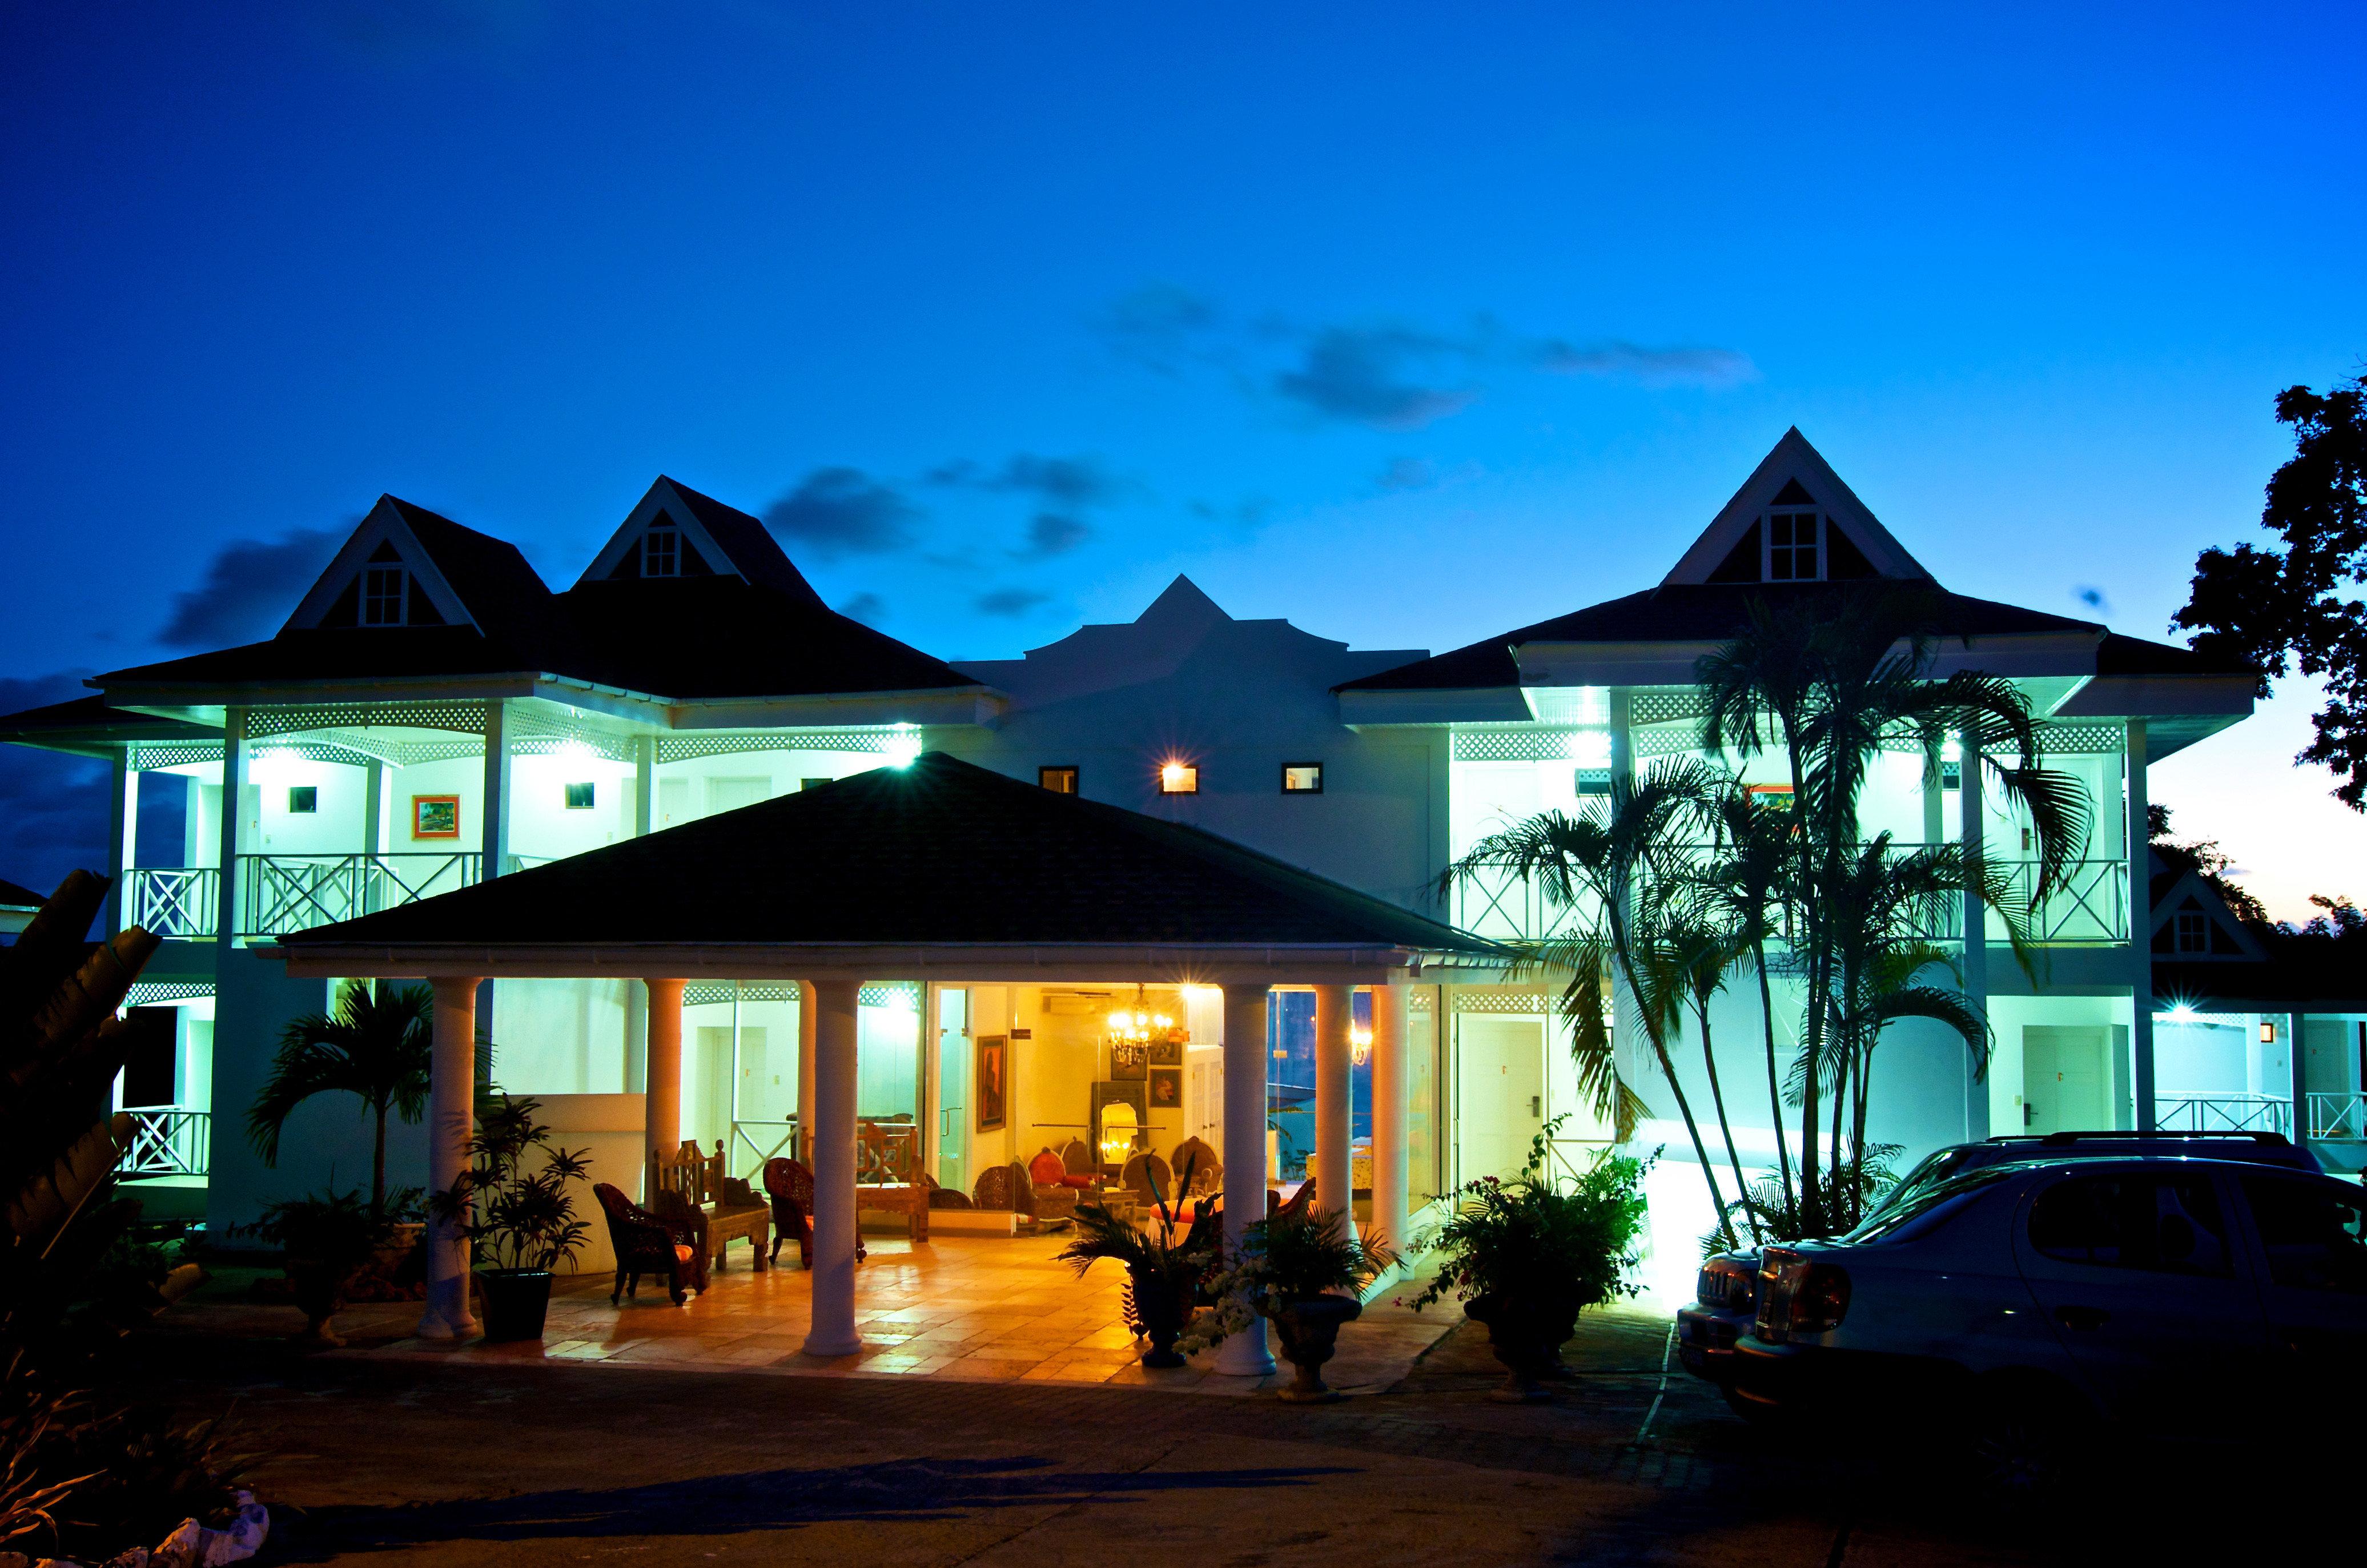 sky house Resort night restaurant evening home sign